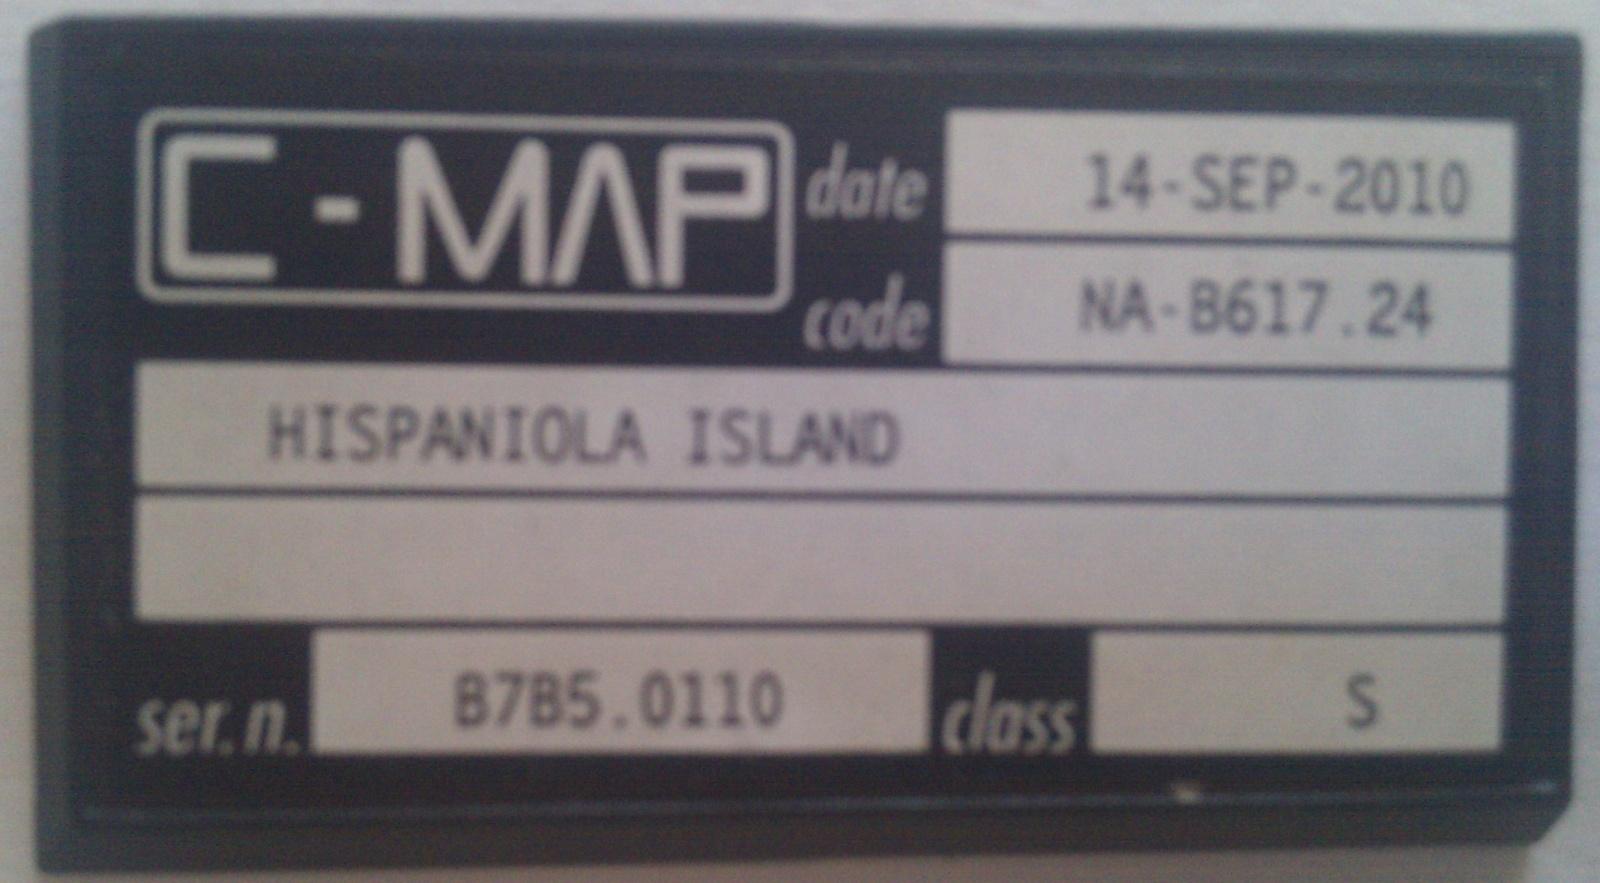 Click image for larger version  Name:C - Map Hispaniola Island.jpg Views:112 Size:337.1 KB ID:41395